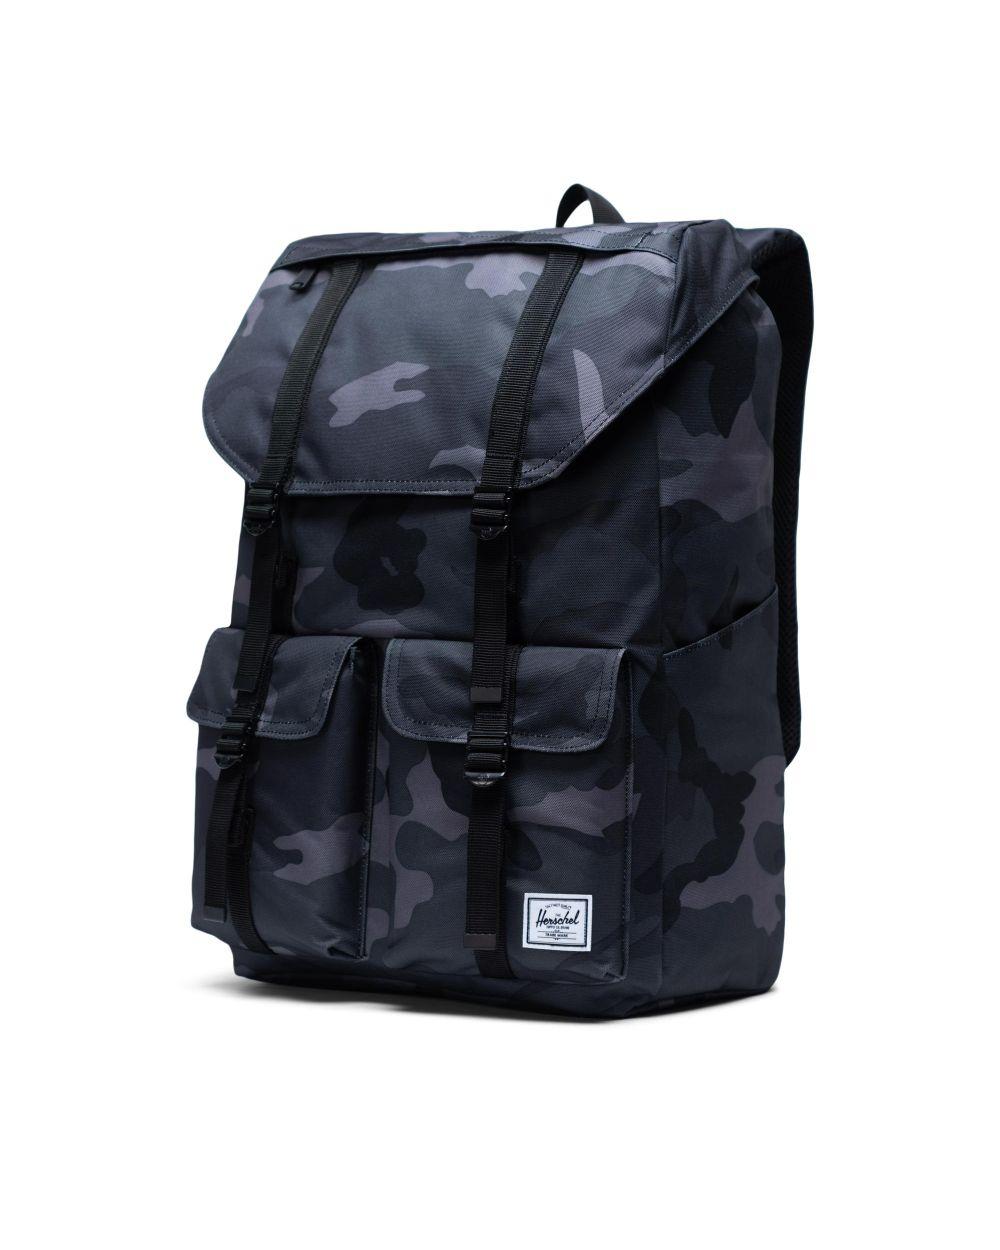 Herschel Buckingham backpack in grey army print